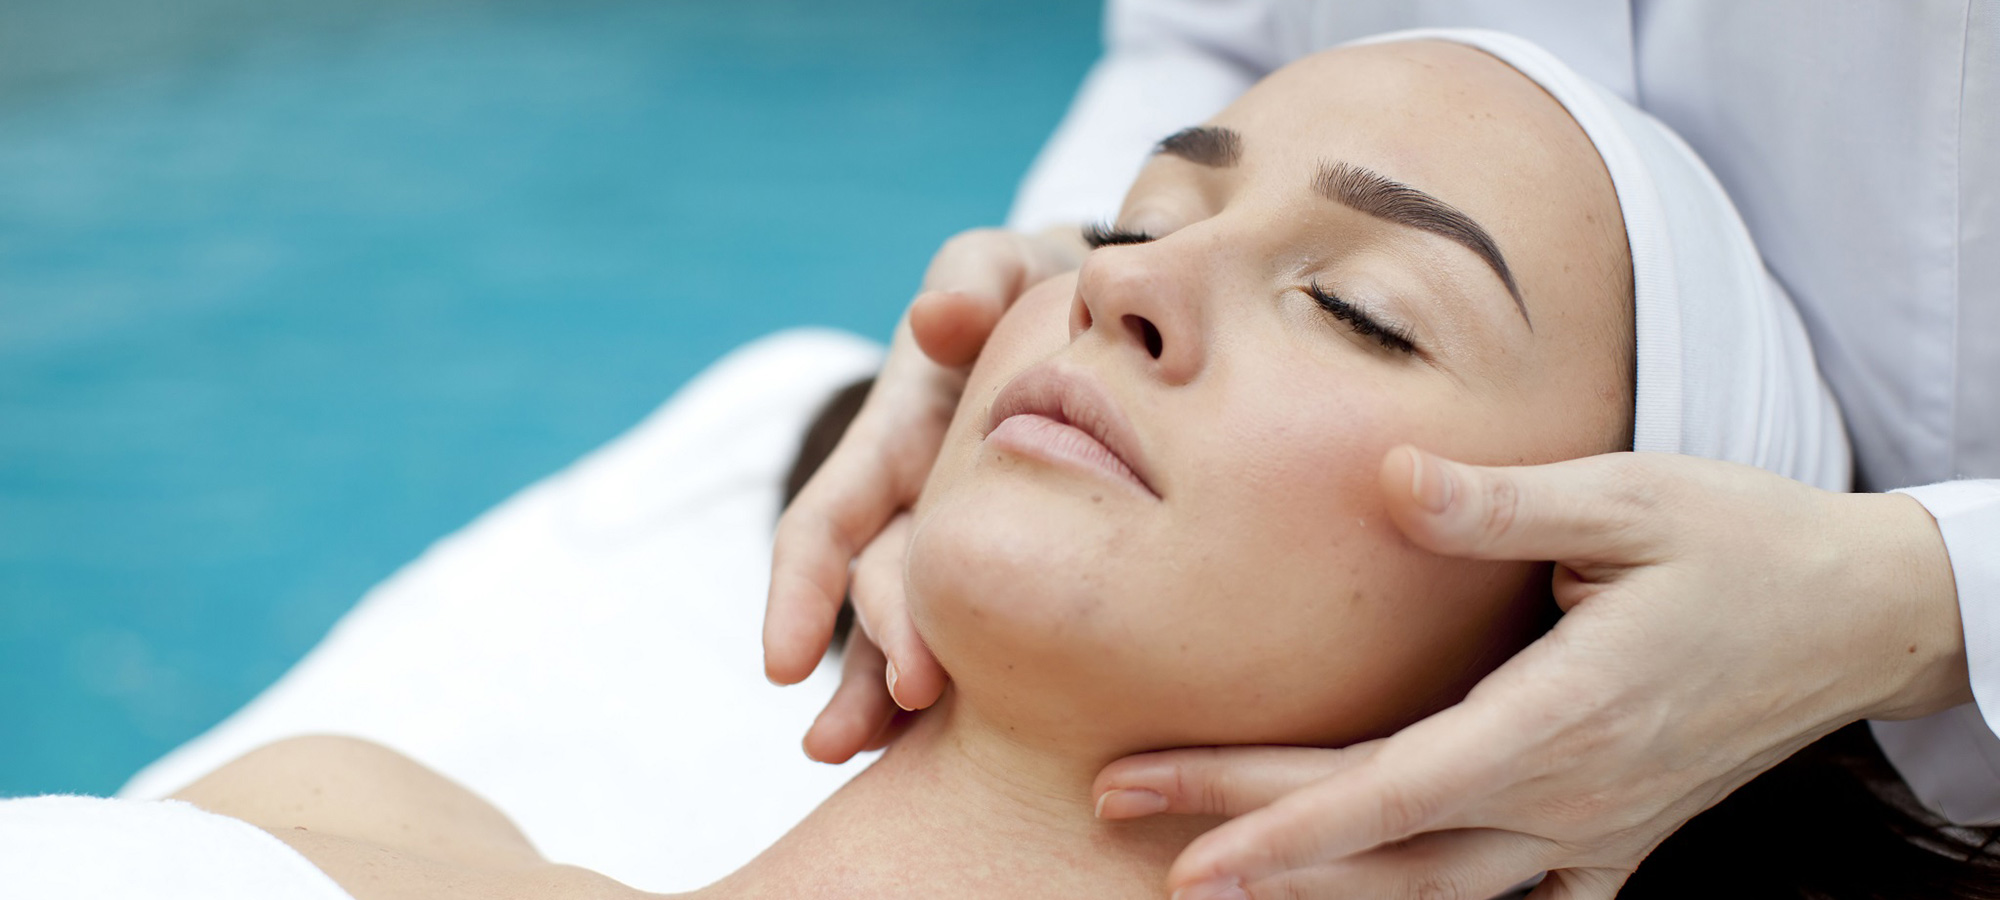 AlumierMD Skin Care